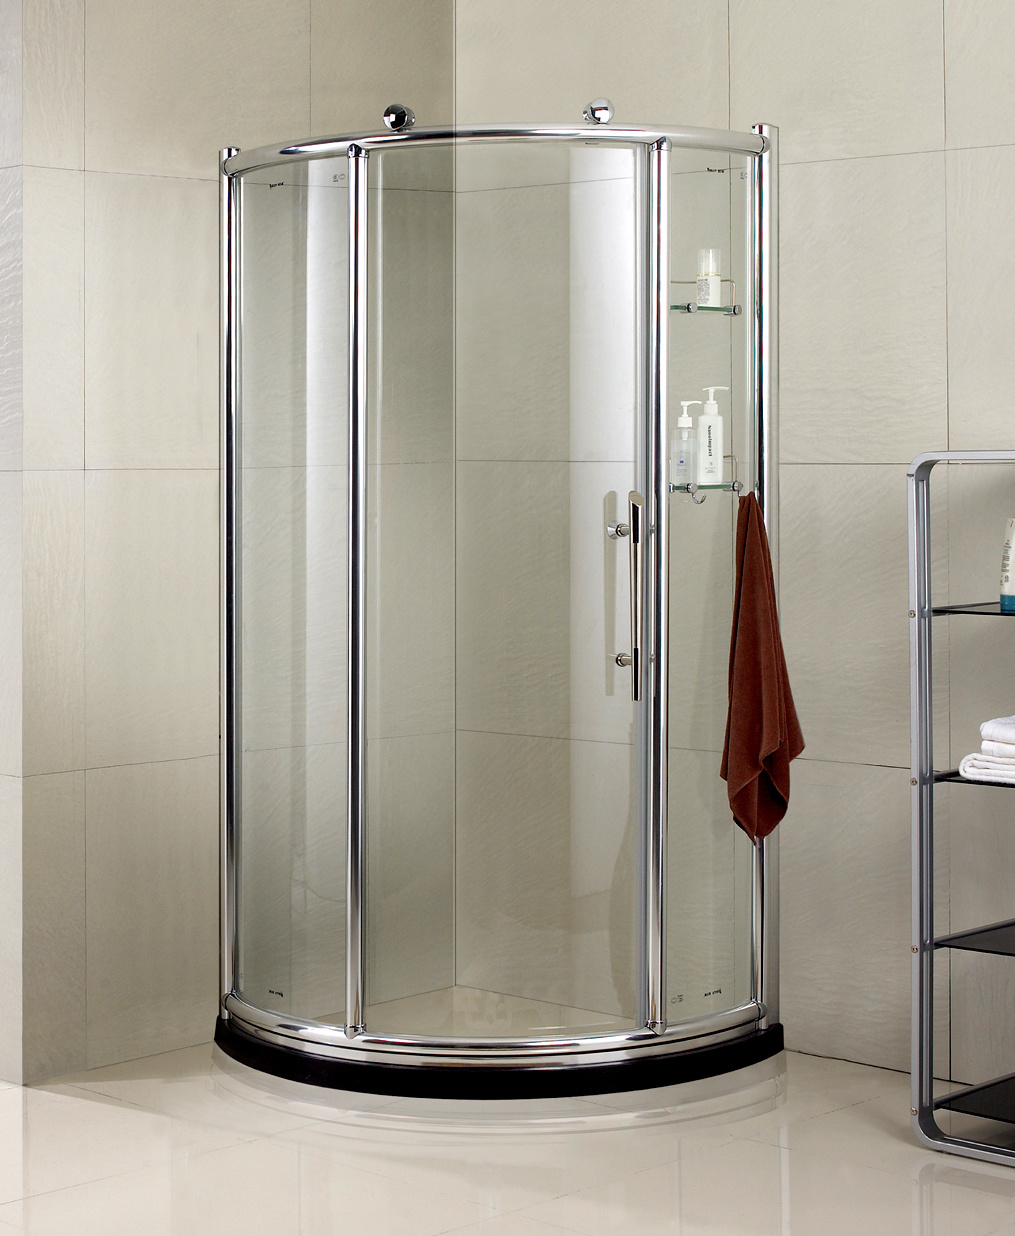 China 8mm Tempered Glass Sliding Door Bath Shower Cabin Stall